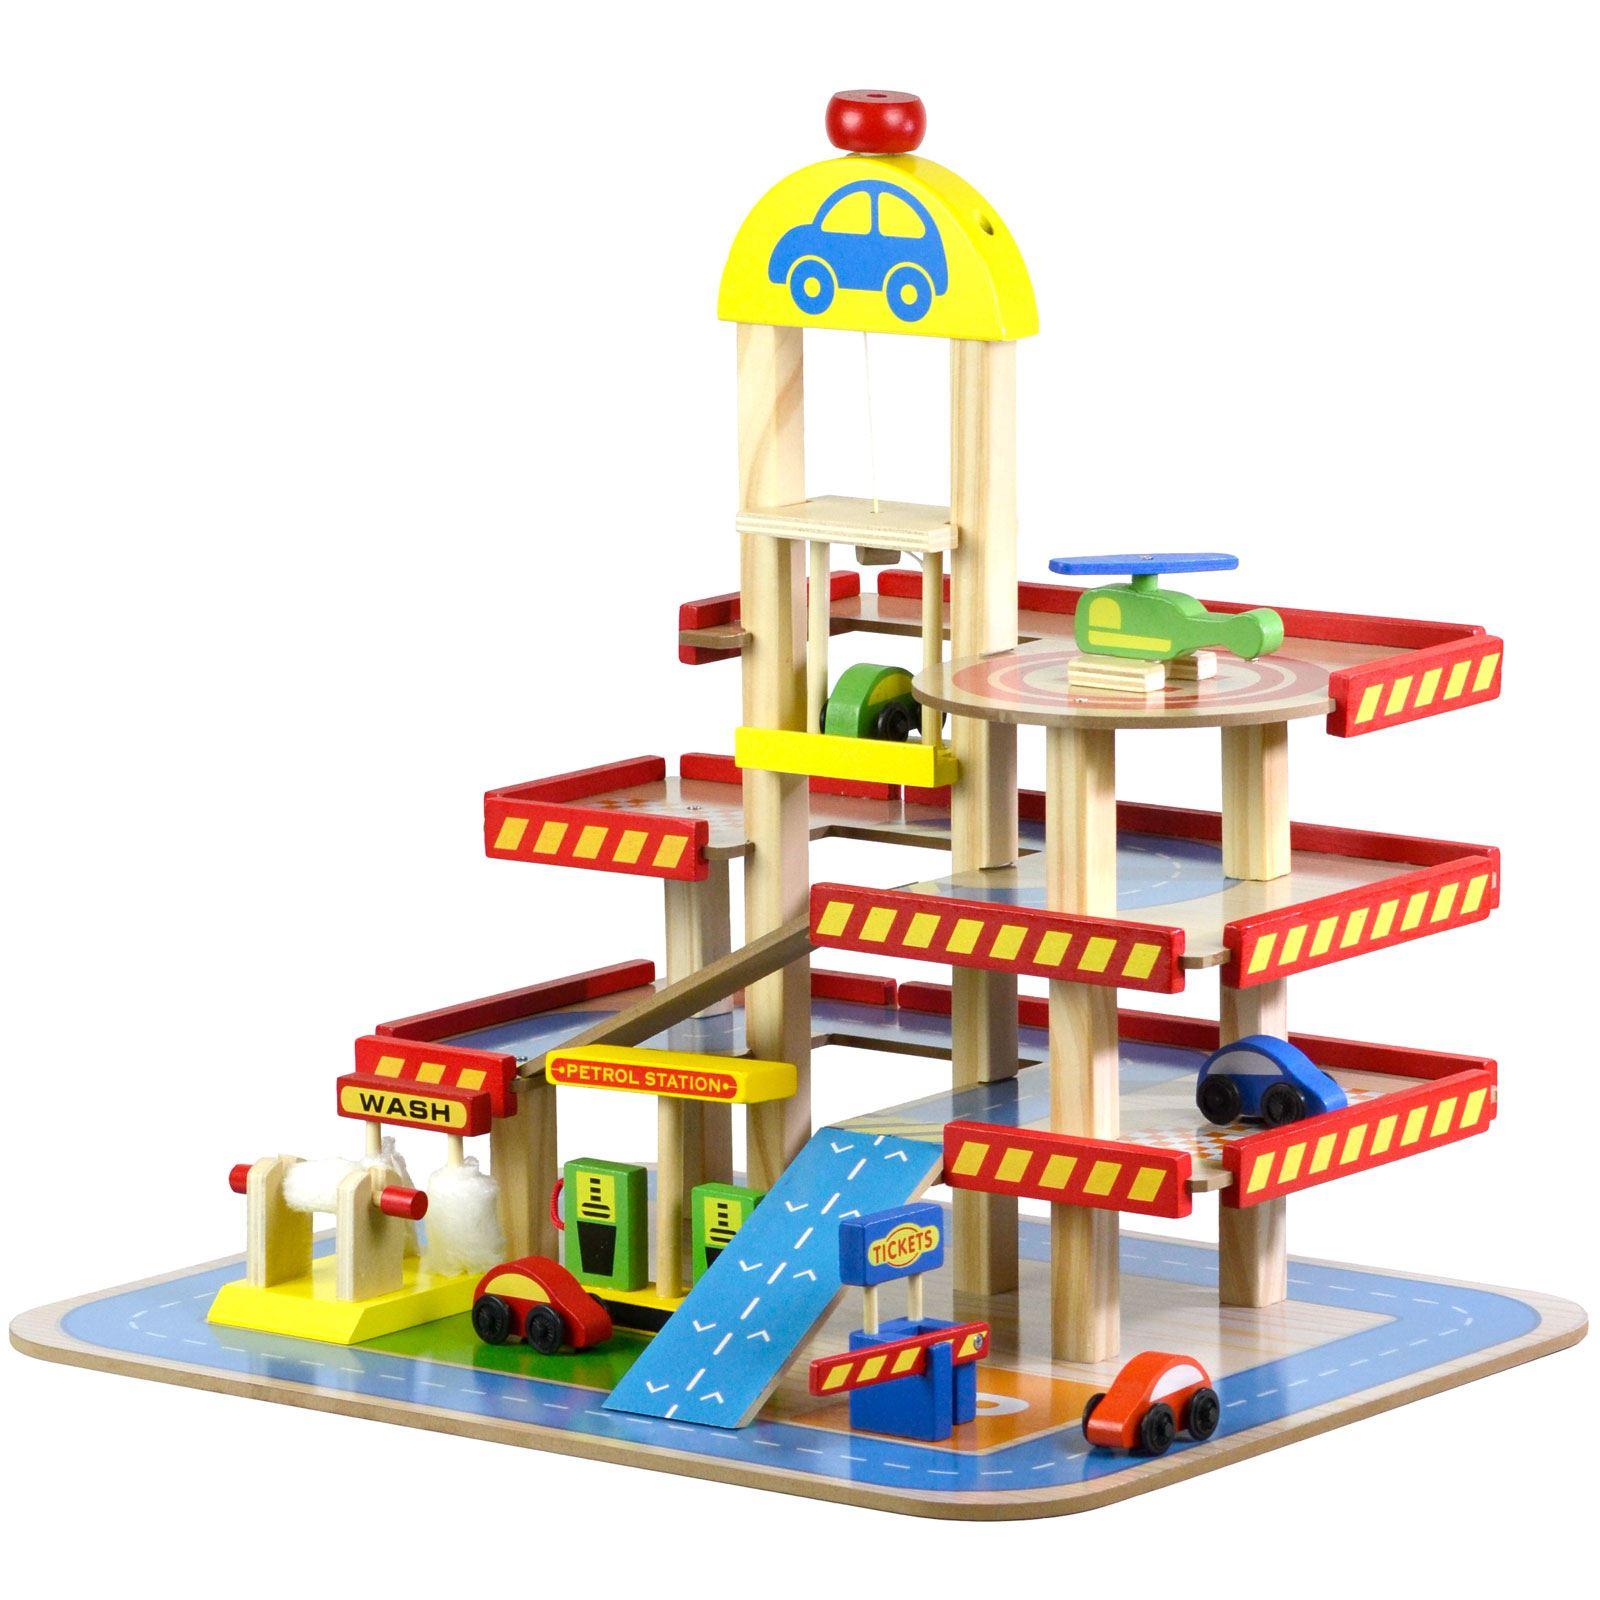 Wooden Toy Car Garage : Wooden multi storey car park petrol garage gas station